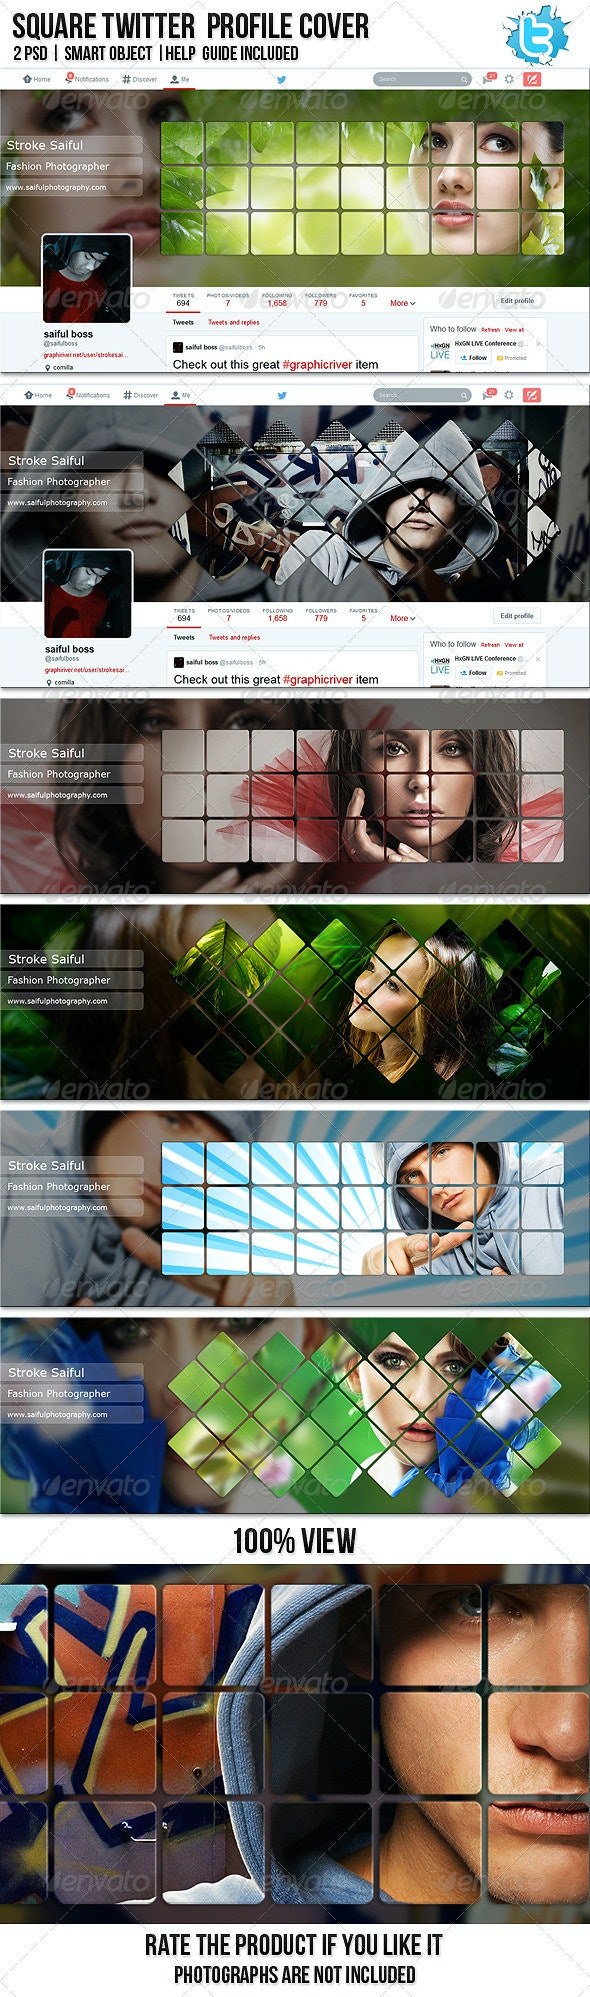 Square Twitter Profile Cover - Twitter Social Media